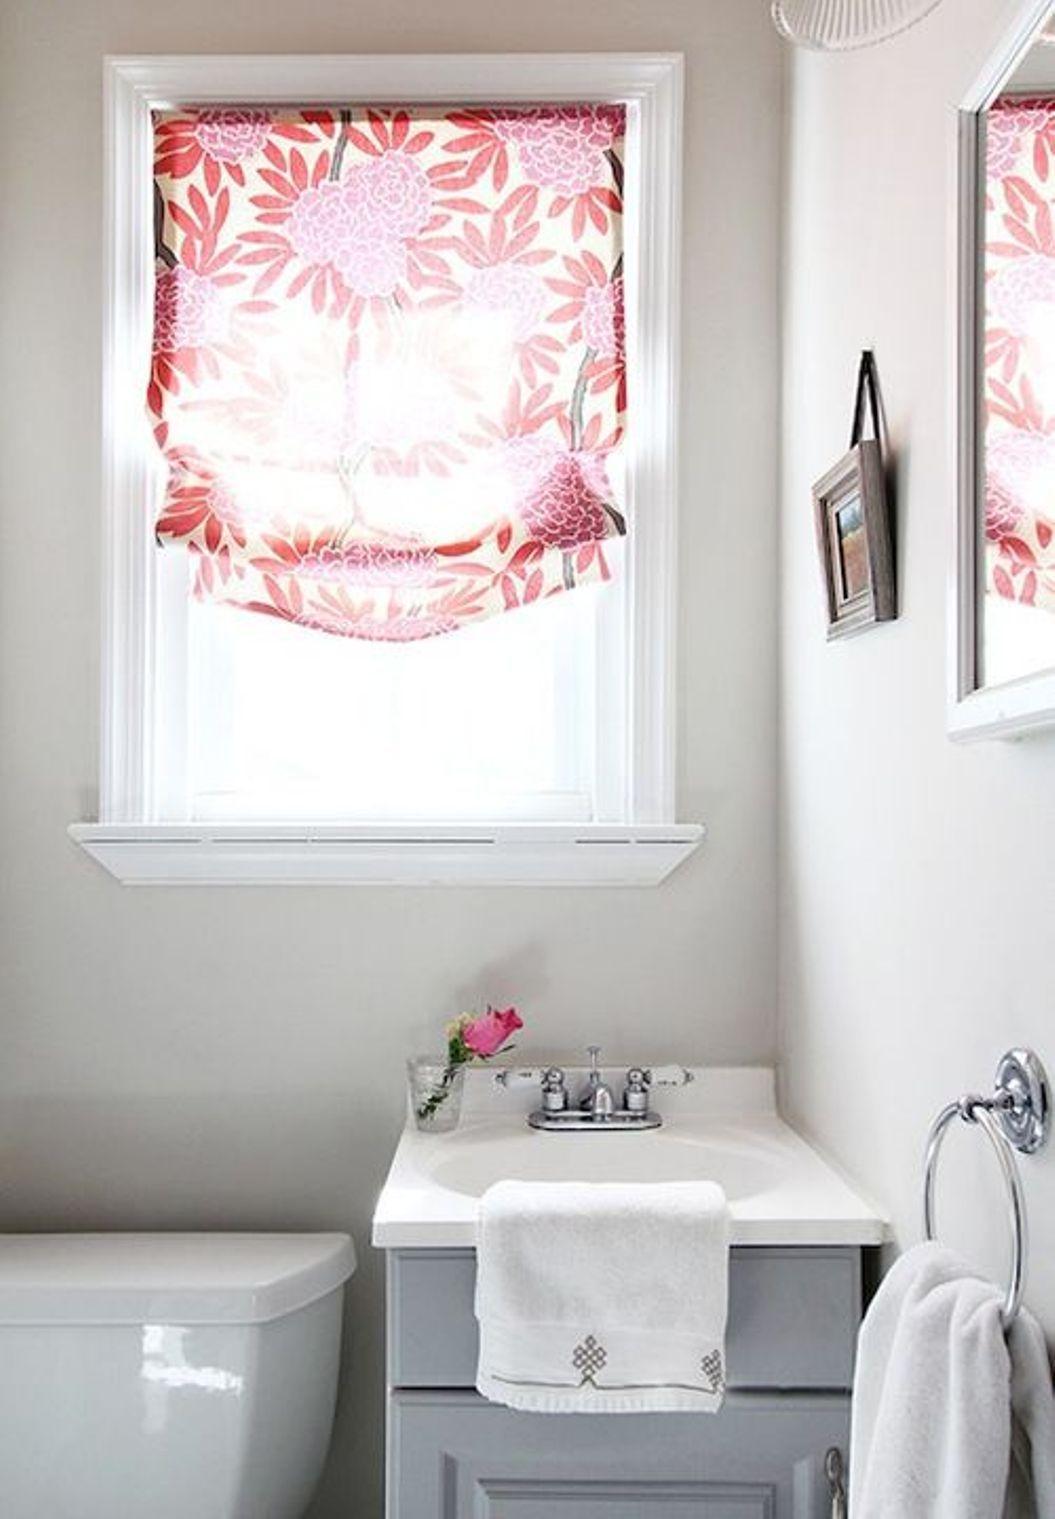 Bed bath and beyond window shades  bathroom window curtains  bathroom renovation ideas  pinterest